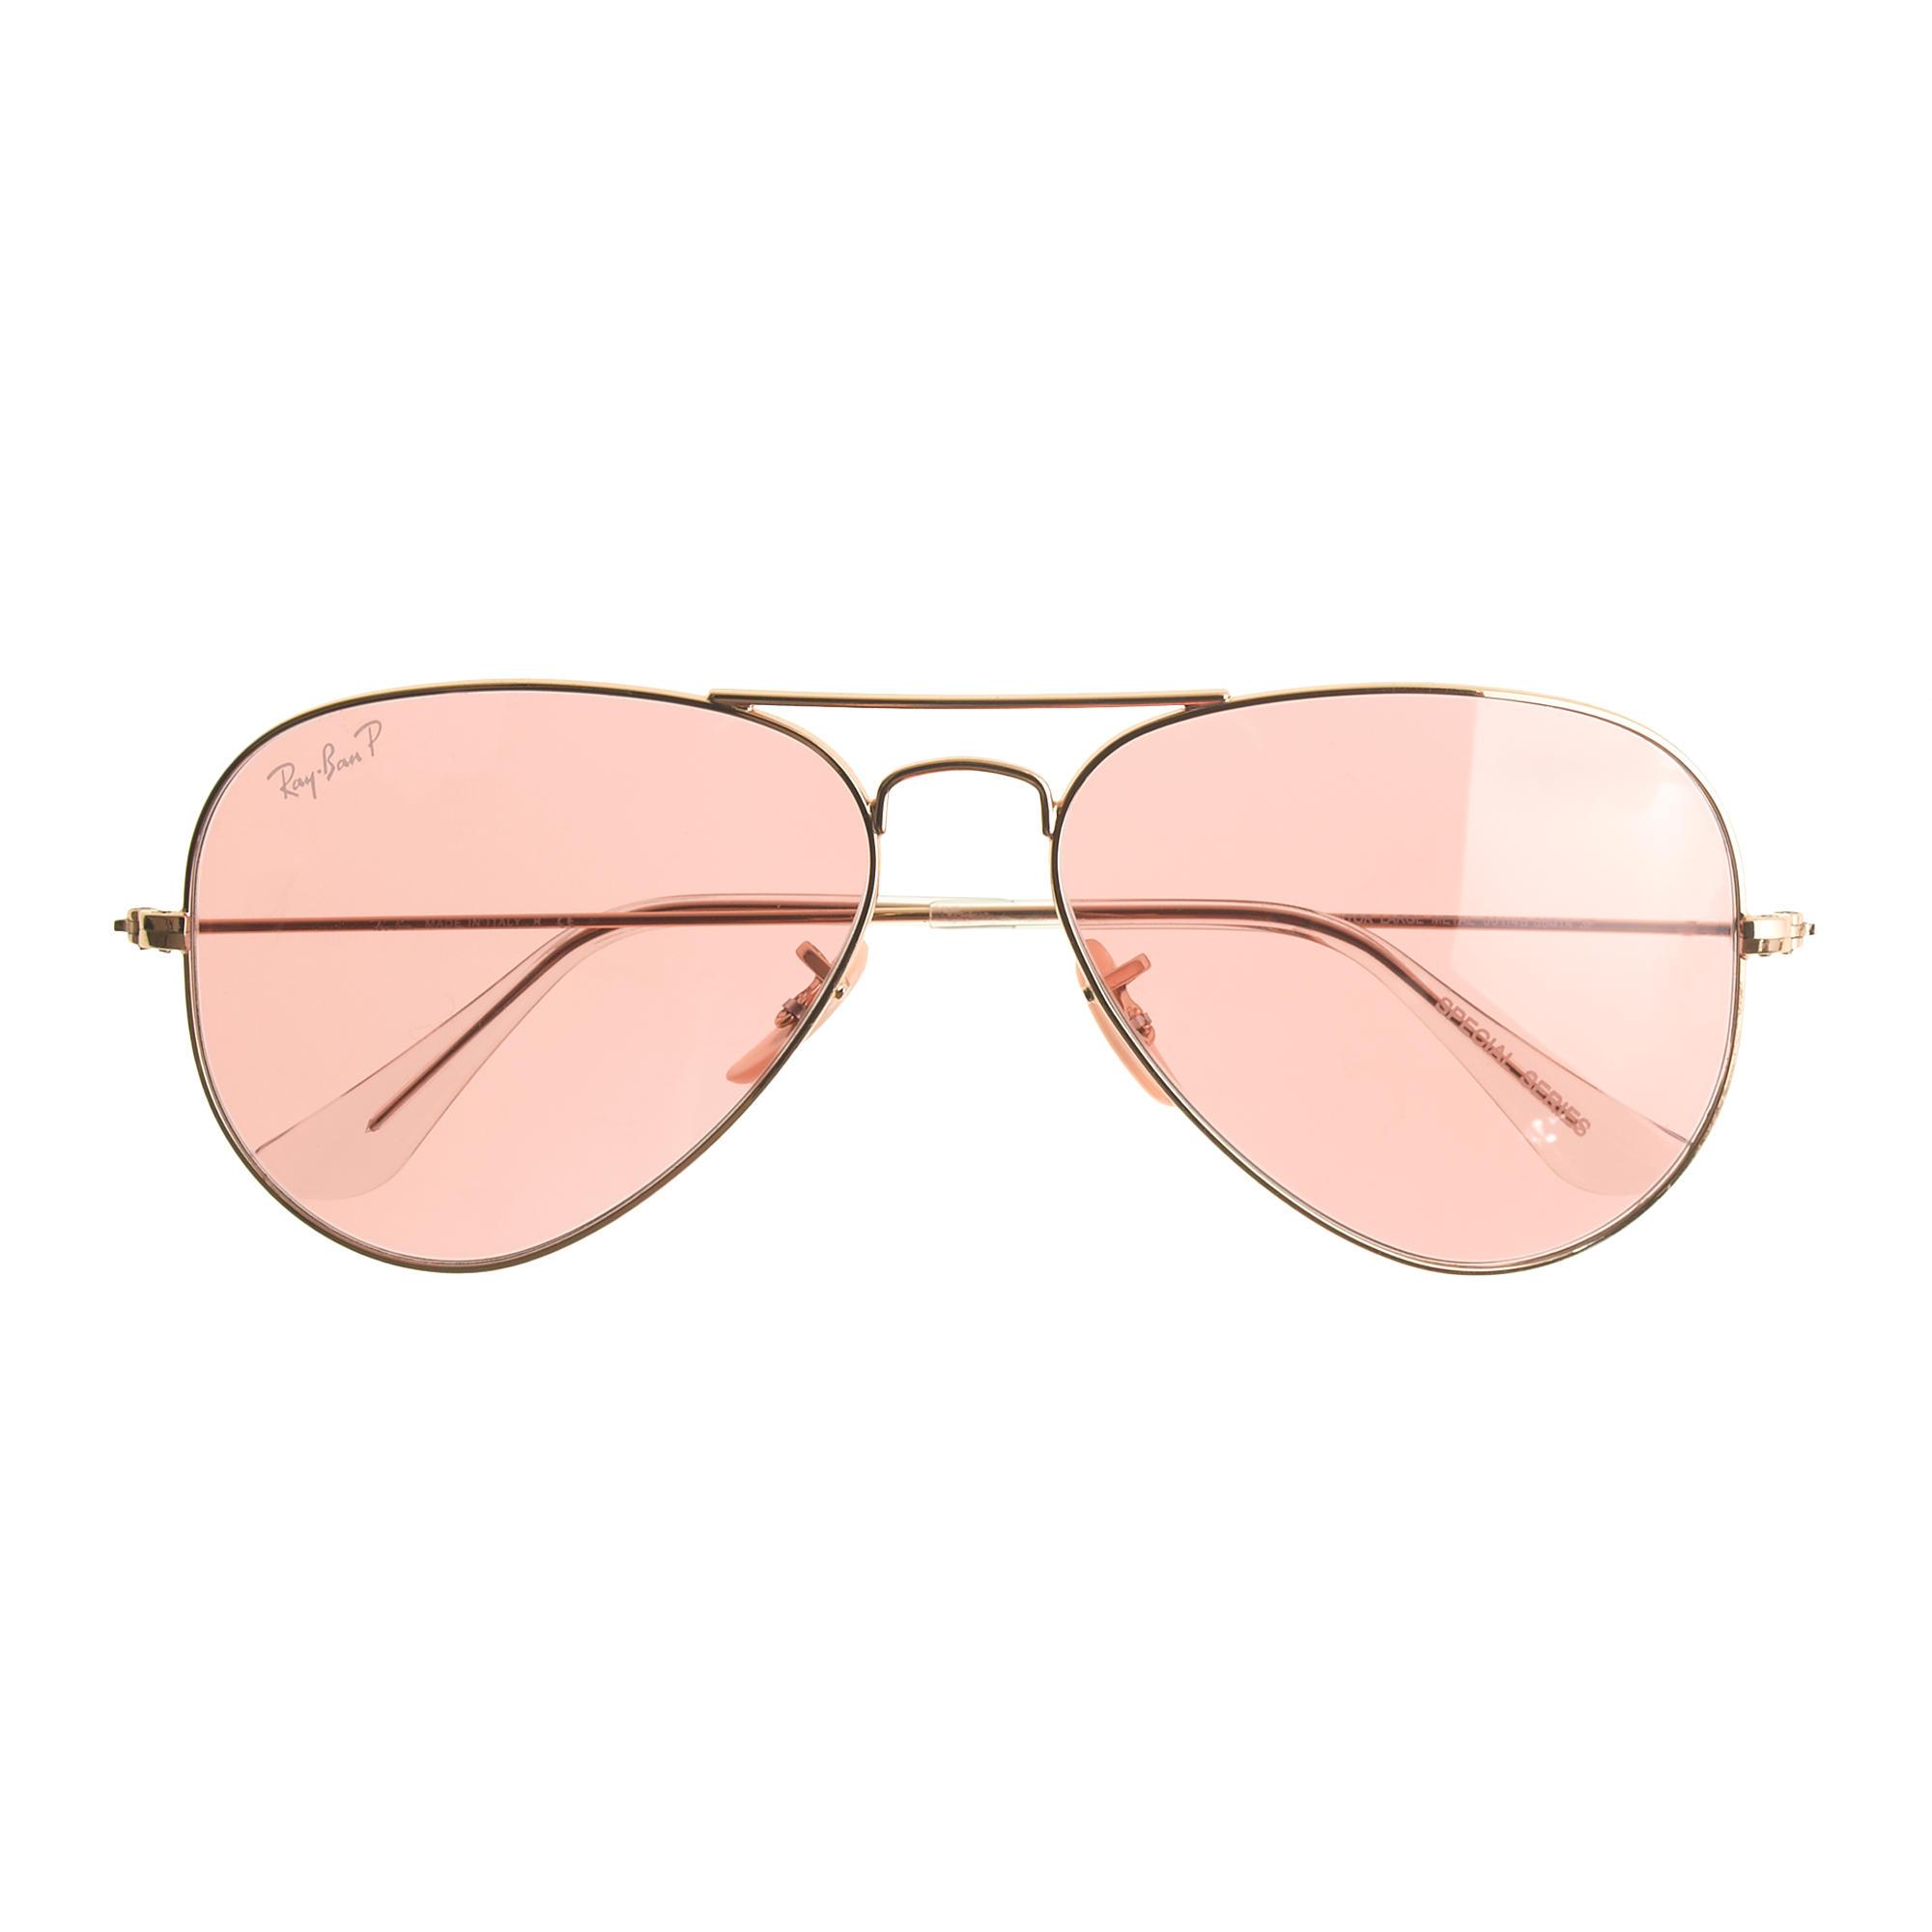 aviator lenses  Ray-Ban庐 Aviator Sunglasses with Polarized Pink Lenses